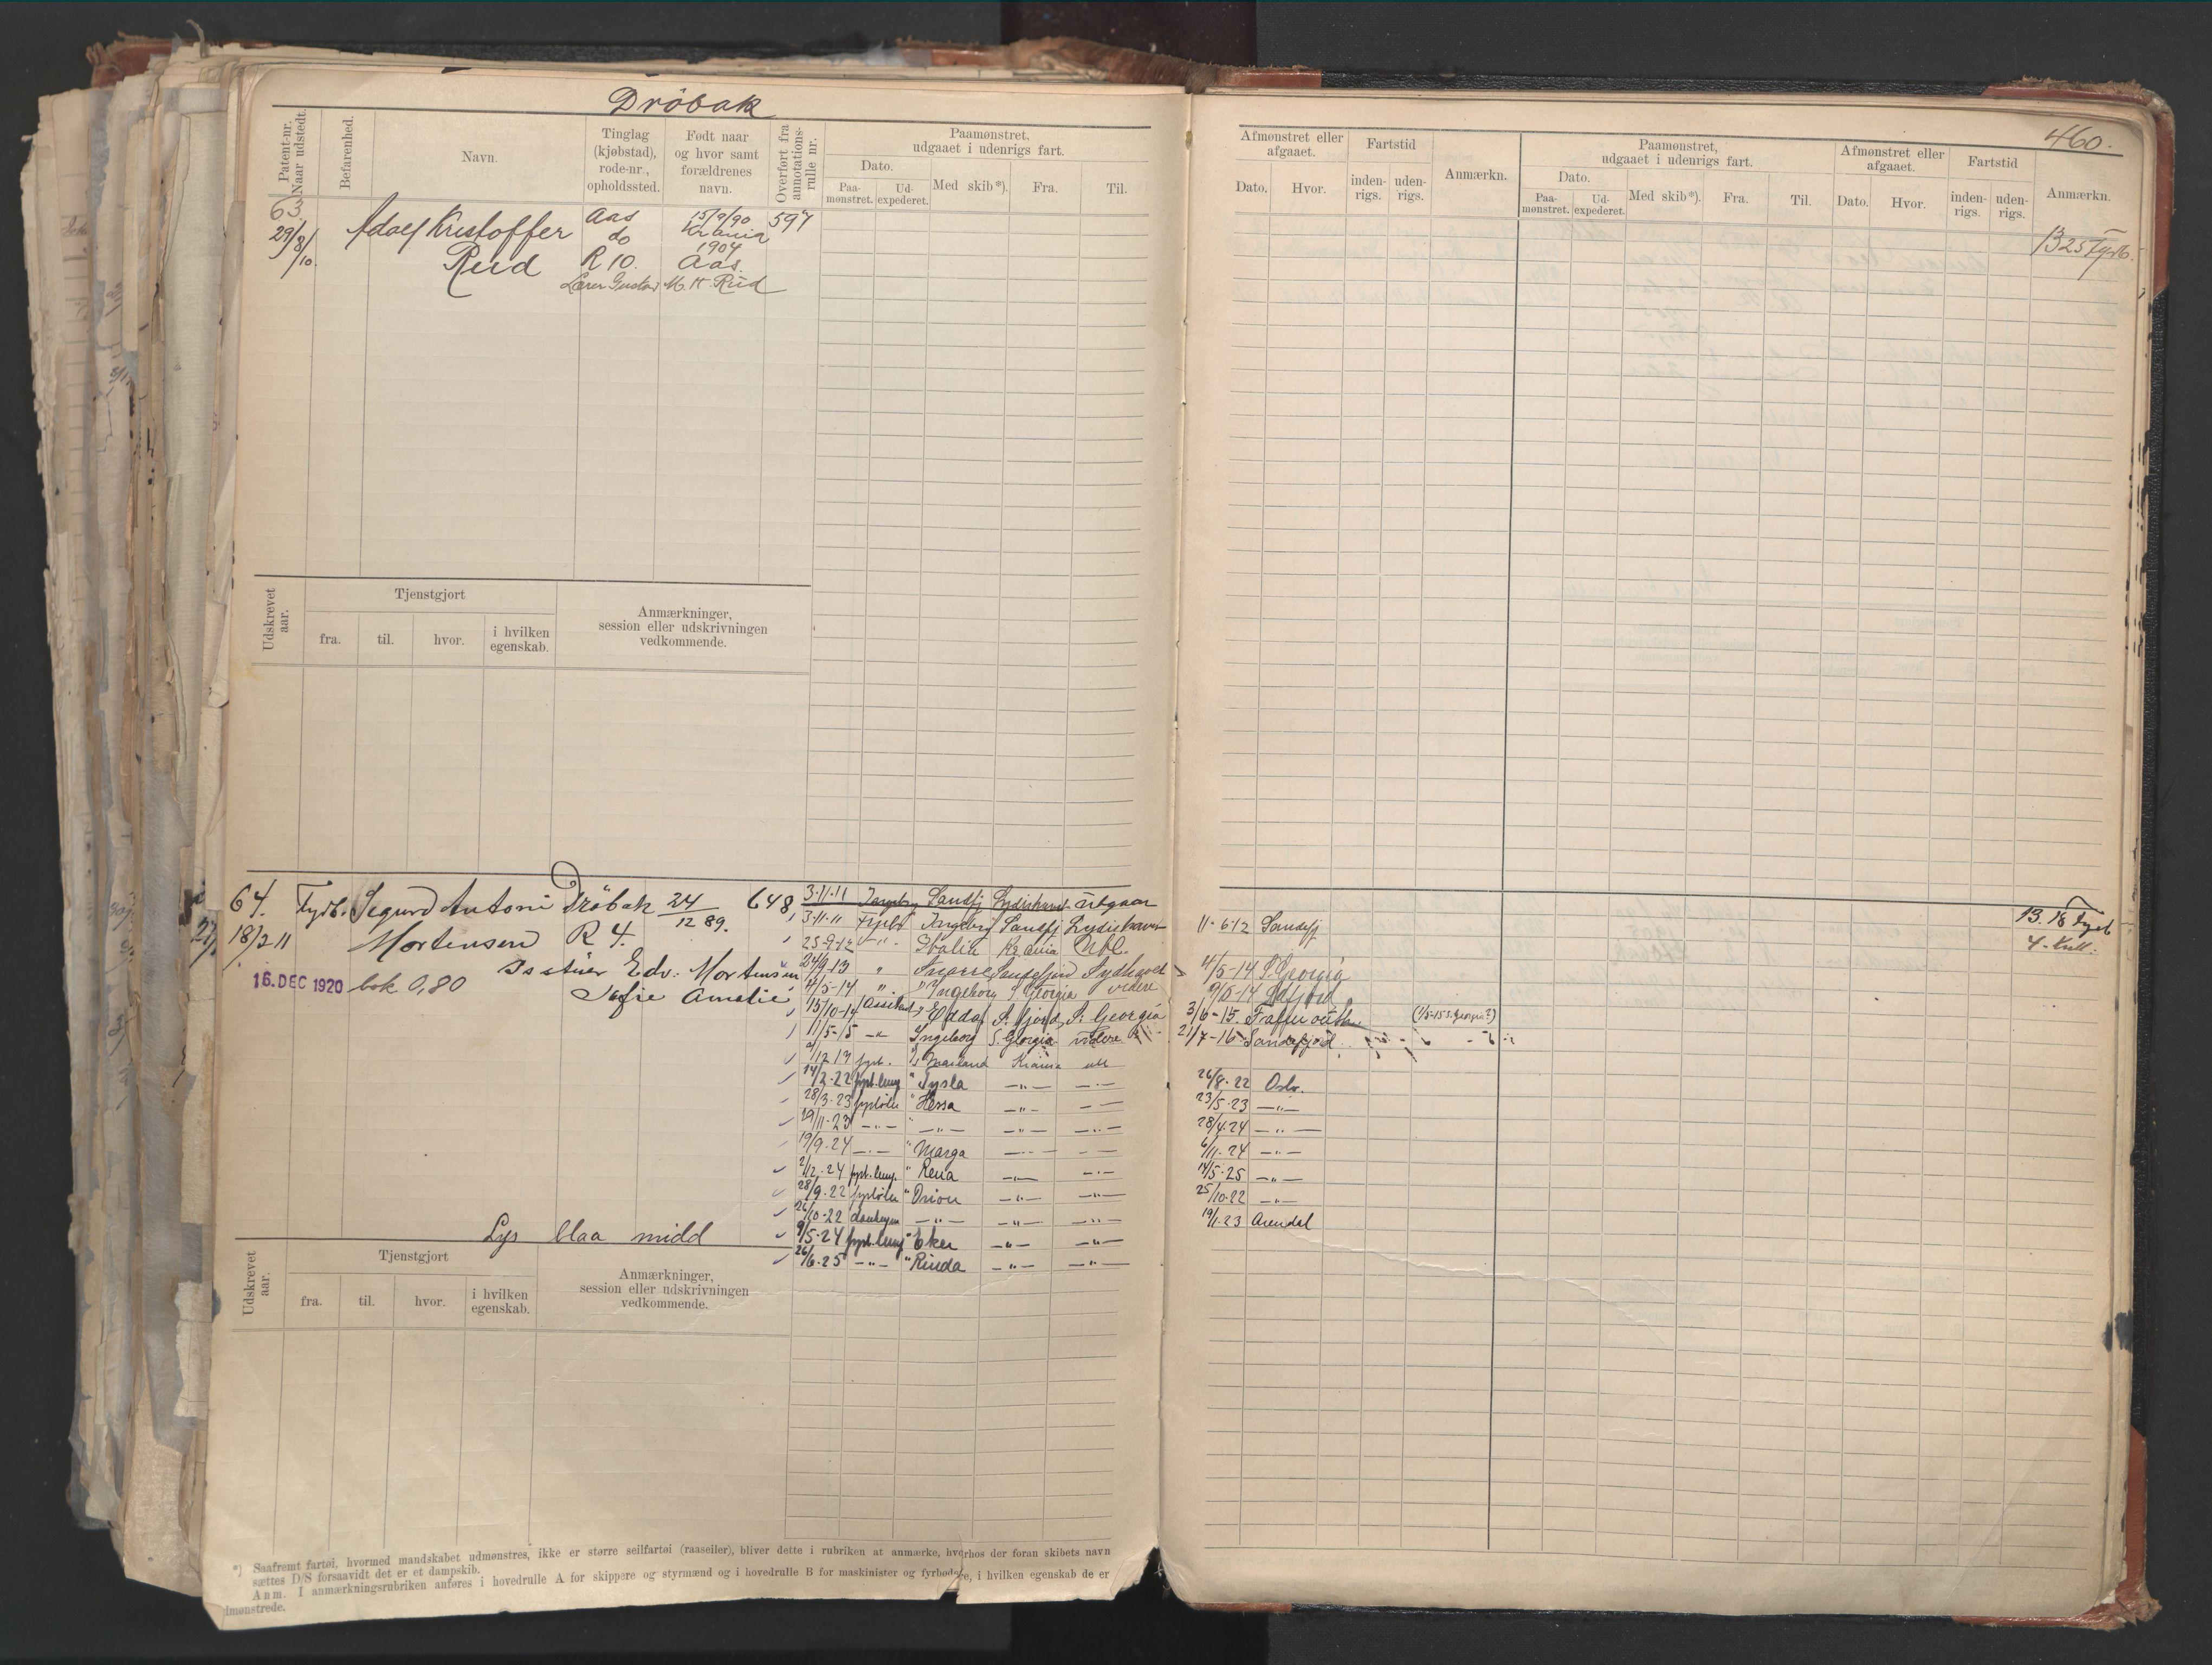 SAO, Oslo sjømannskontor, F/Fd/L0006: B-rulle, 1883, s. 459b-460a